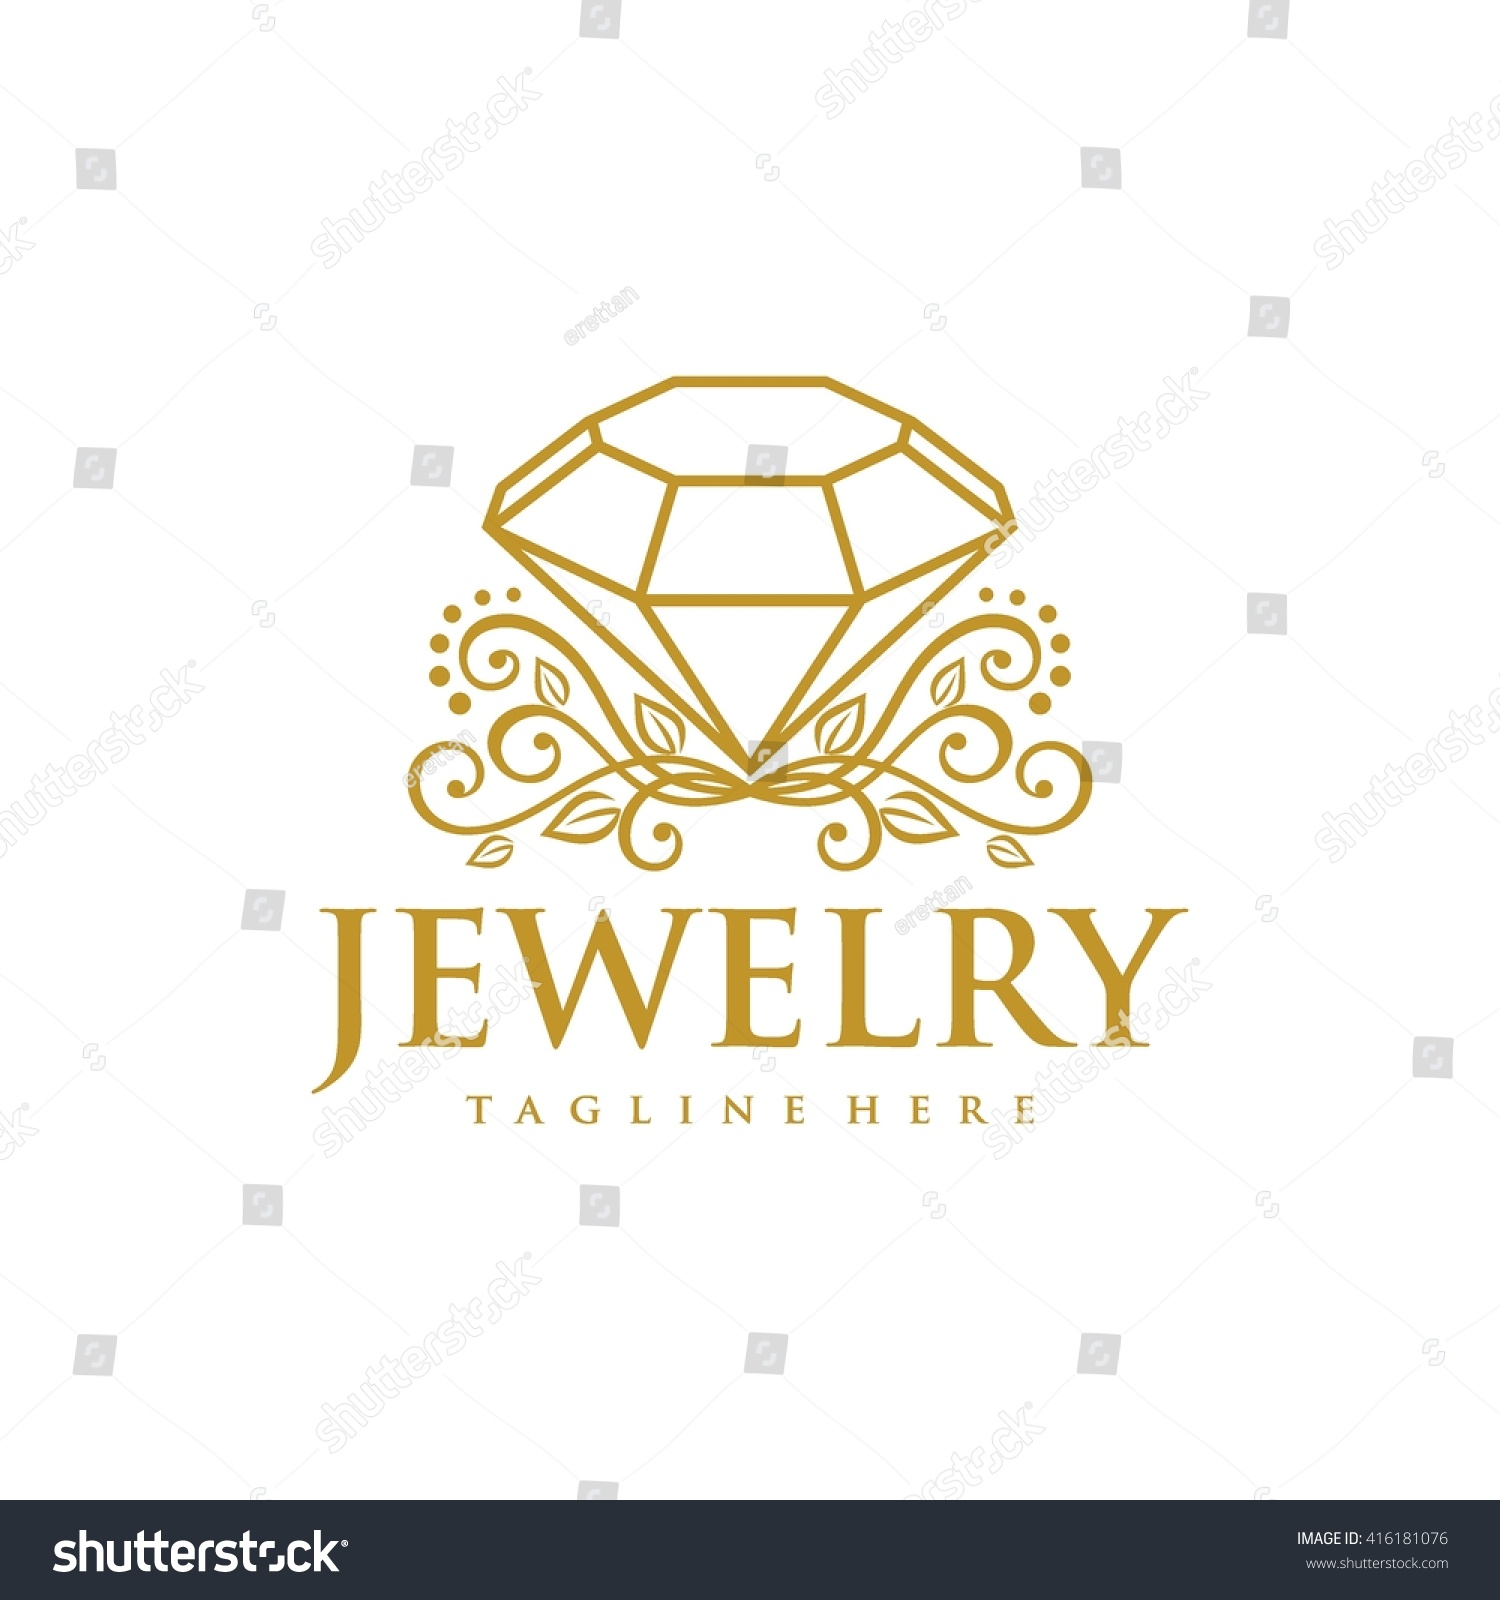 jewelry logo template stock vector 416181076